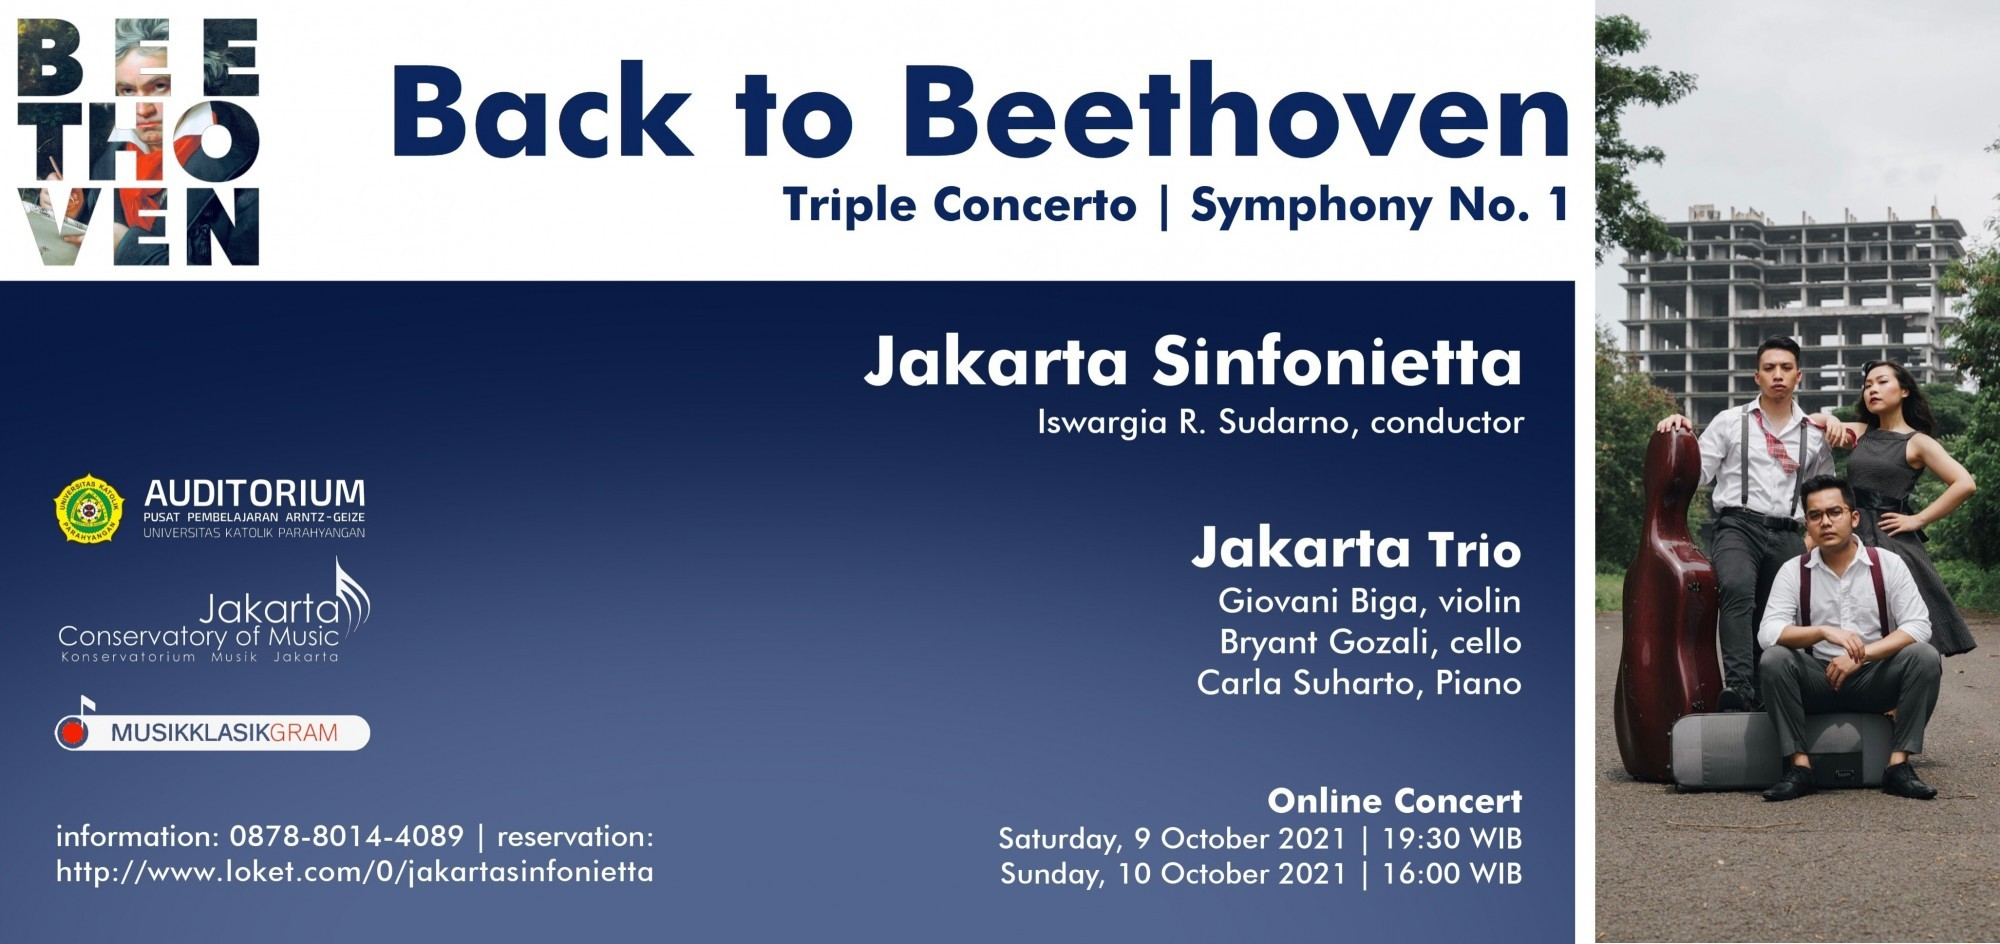 Back To Beethoven  Jakarta Sinfonietta  Jakarta Trio (Saturday 09/10/21)